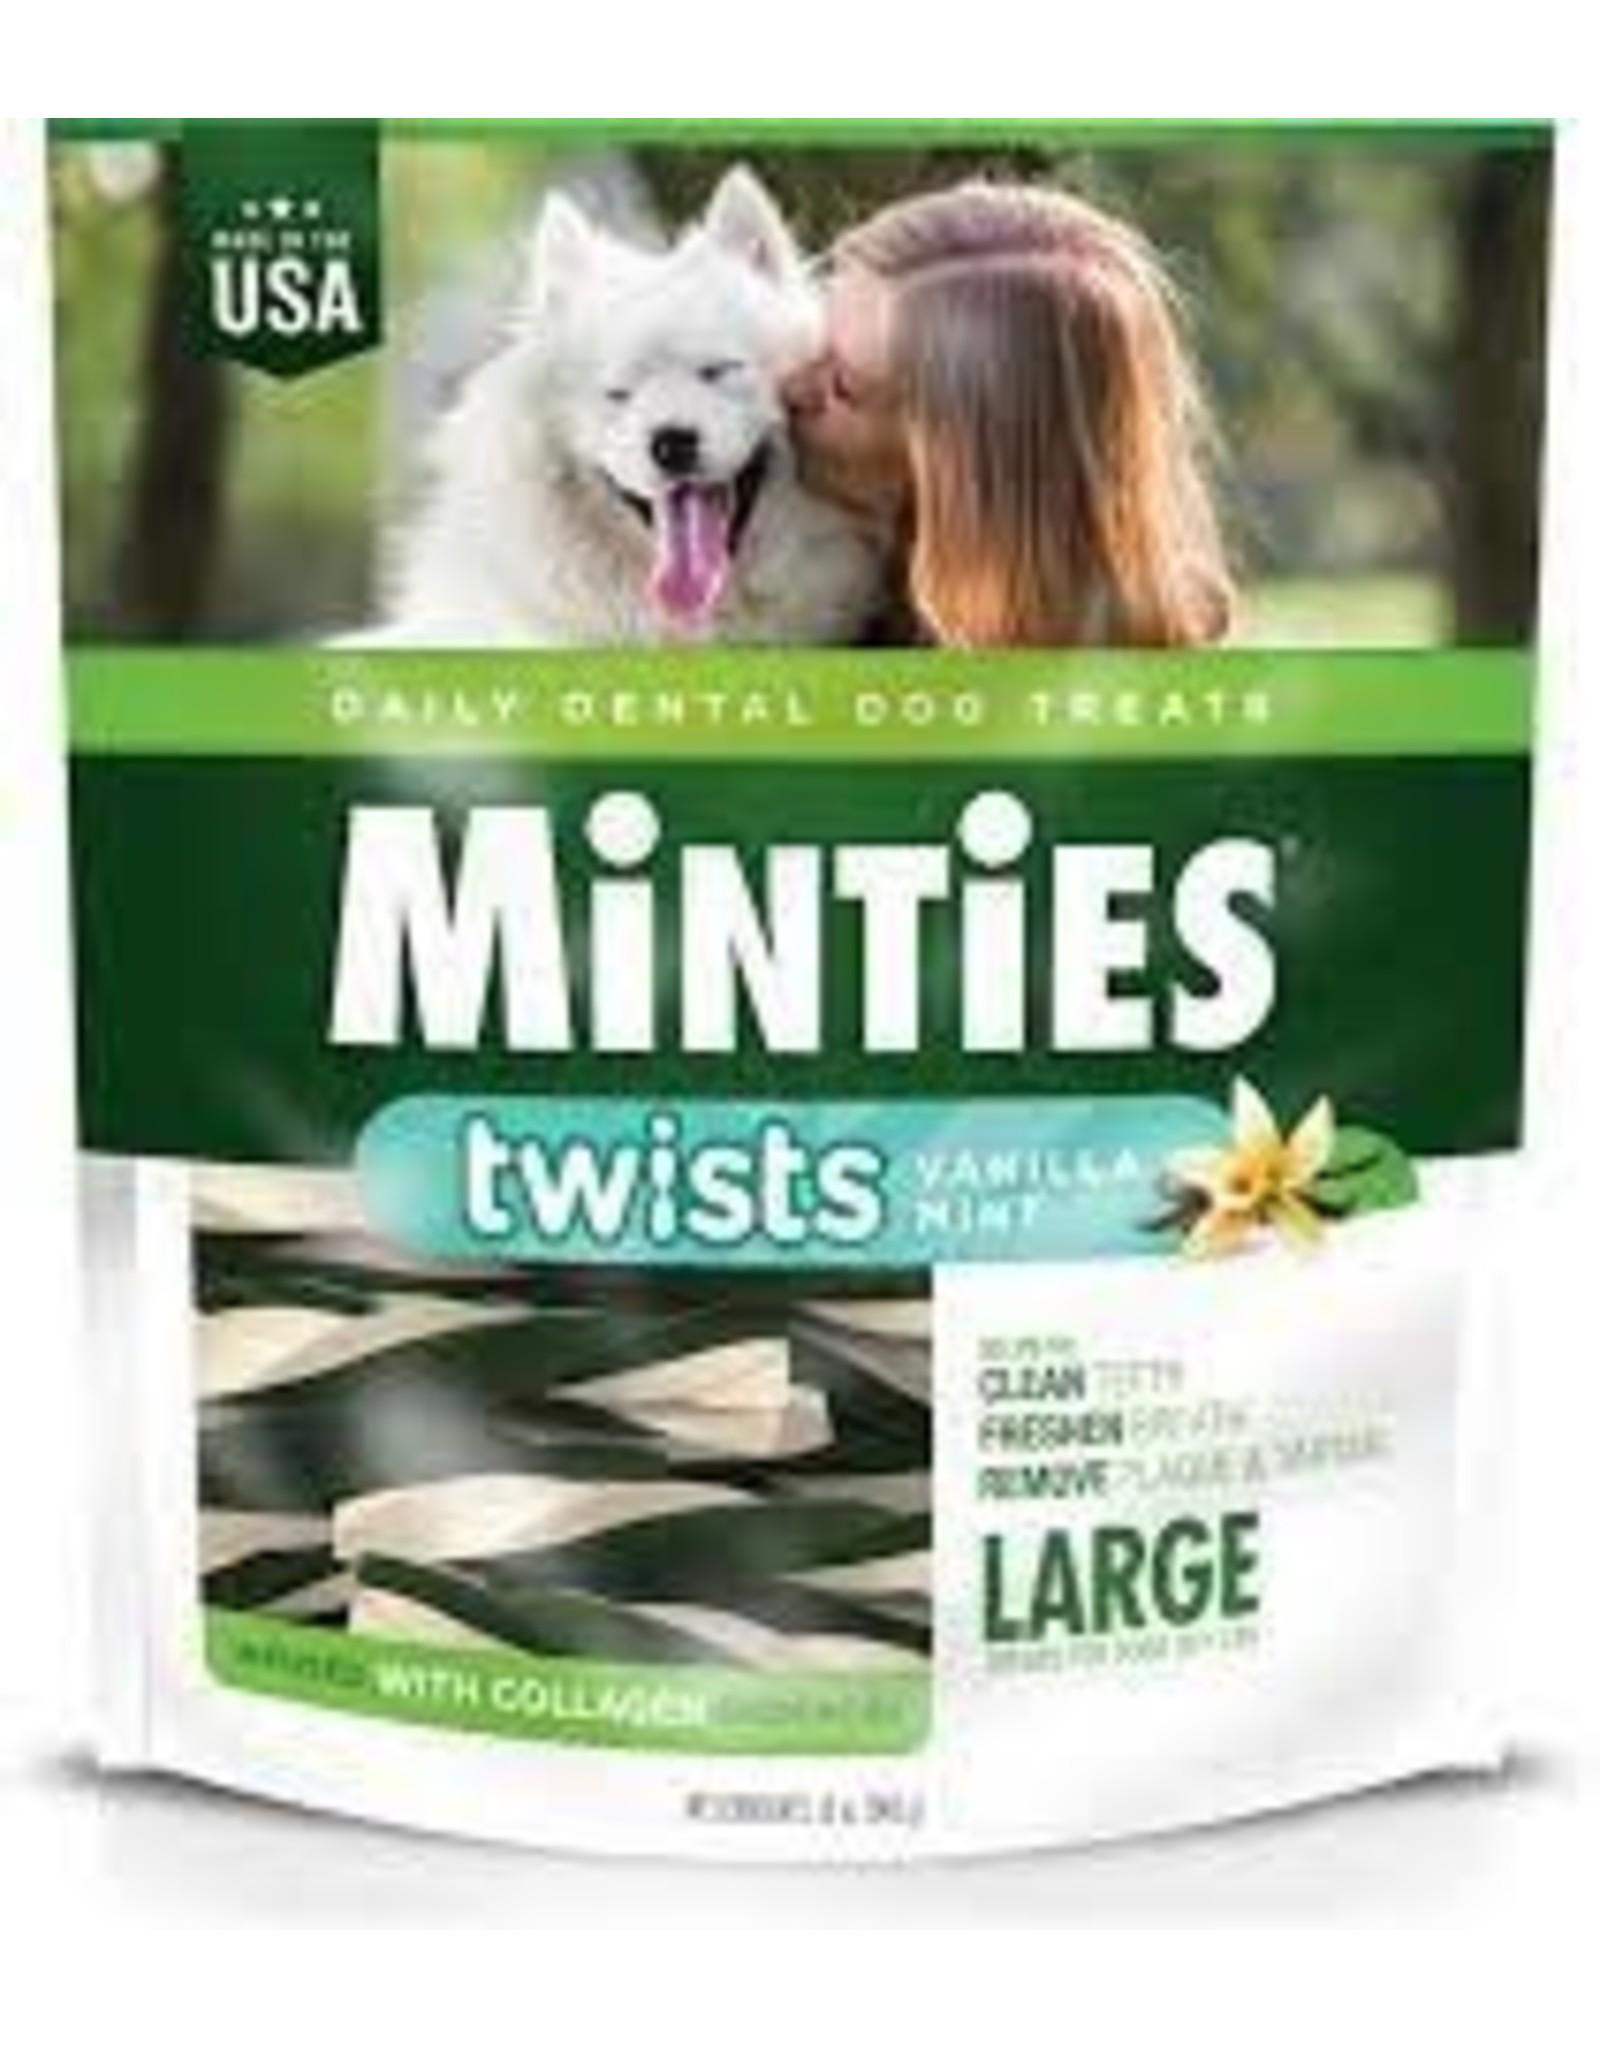 MInties Maximum Minties - Twists Vanilla Mint